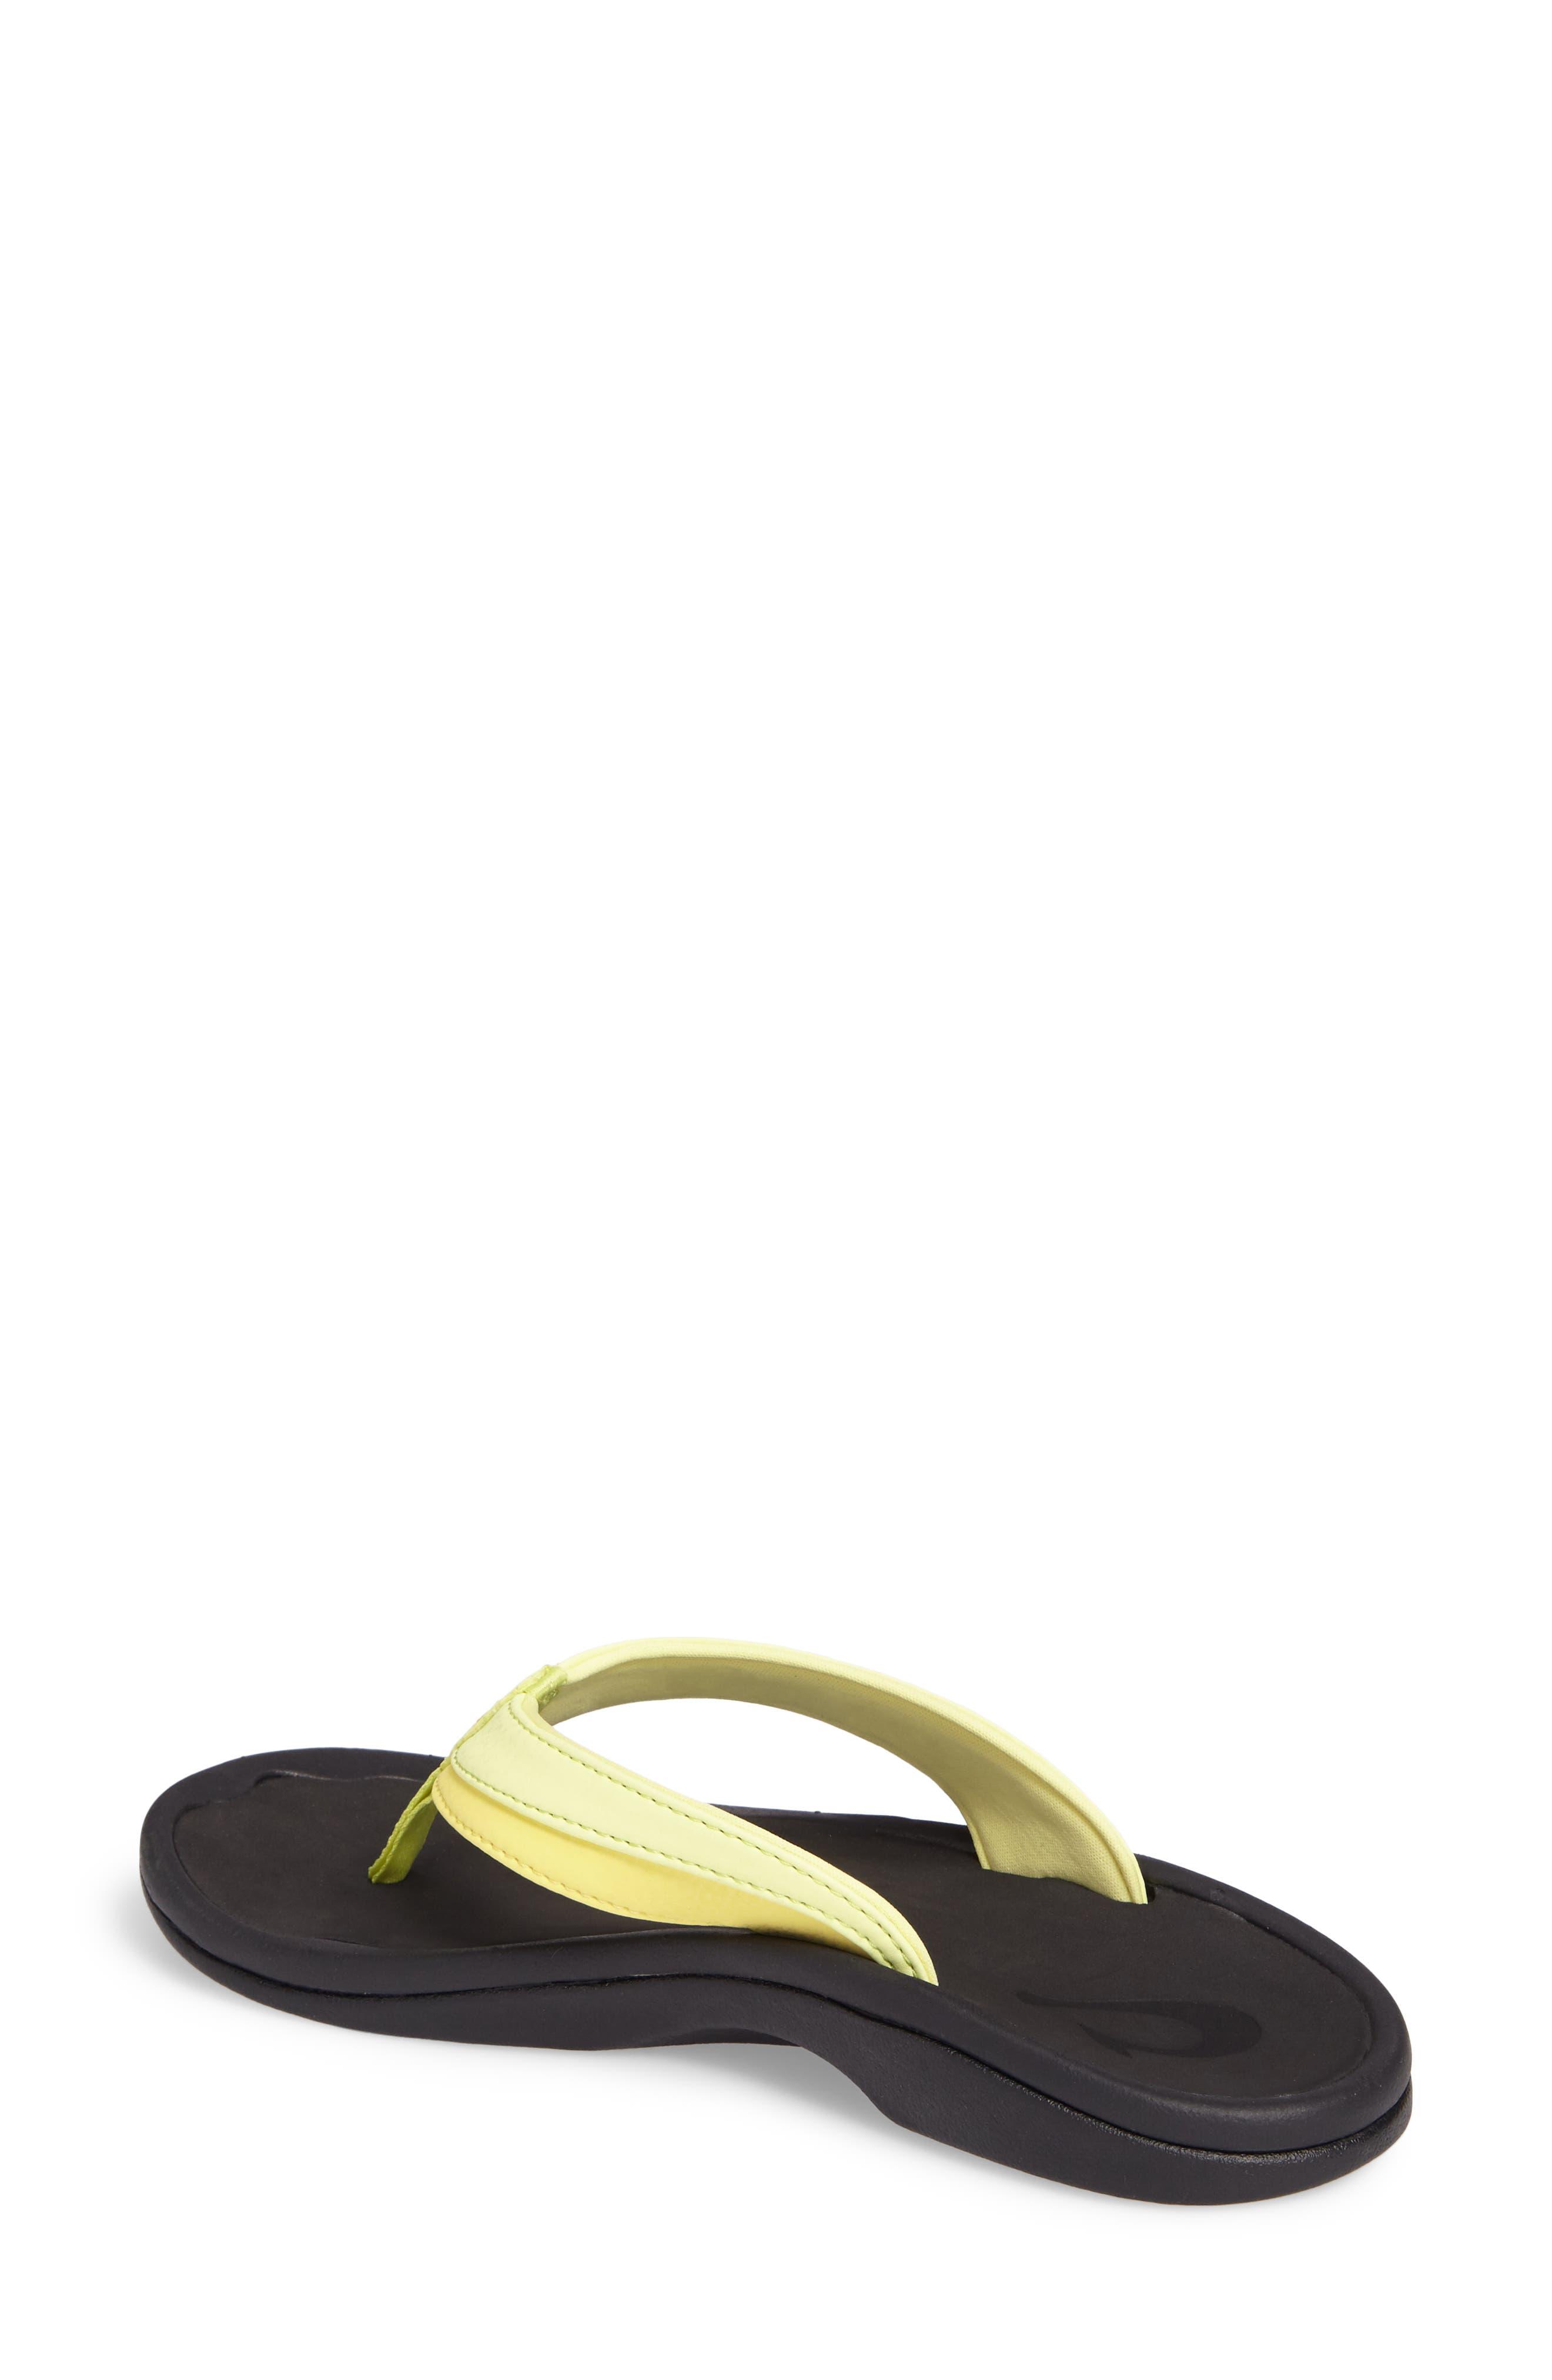 Alternate Image 2  - OluKai 'Ohana' Sandal (Women)